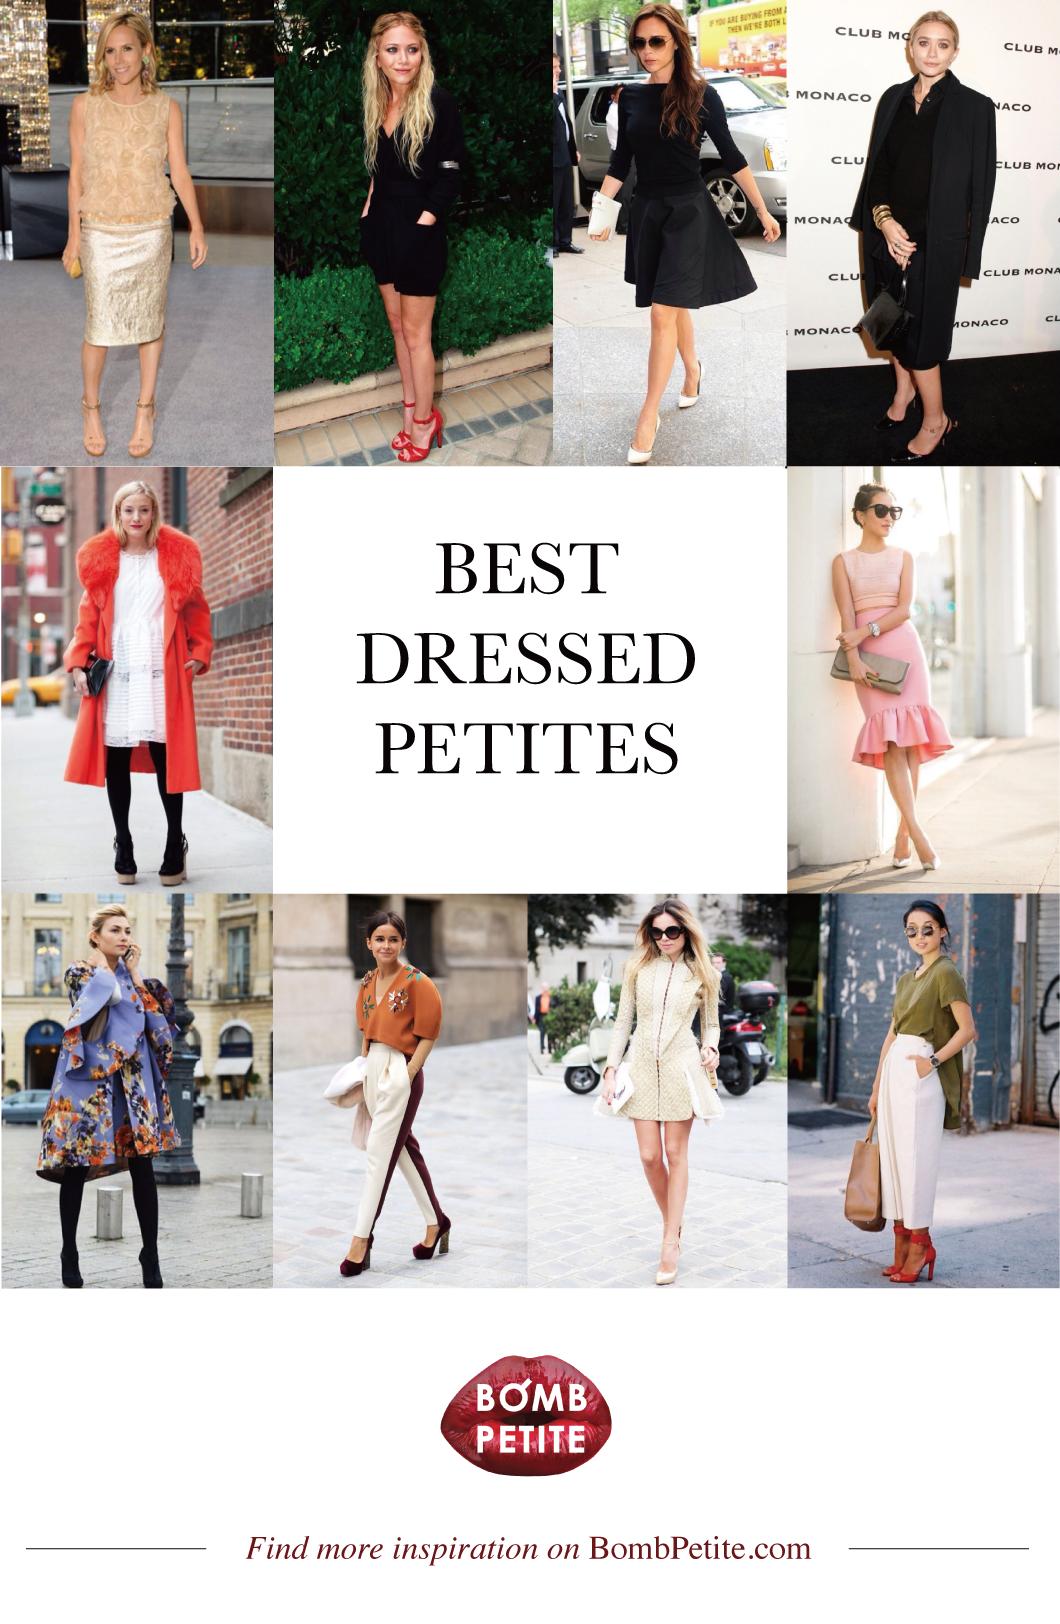 Best Dressed Petites -Bomb Petite  Stylish petite woman, Stylish